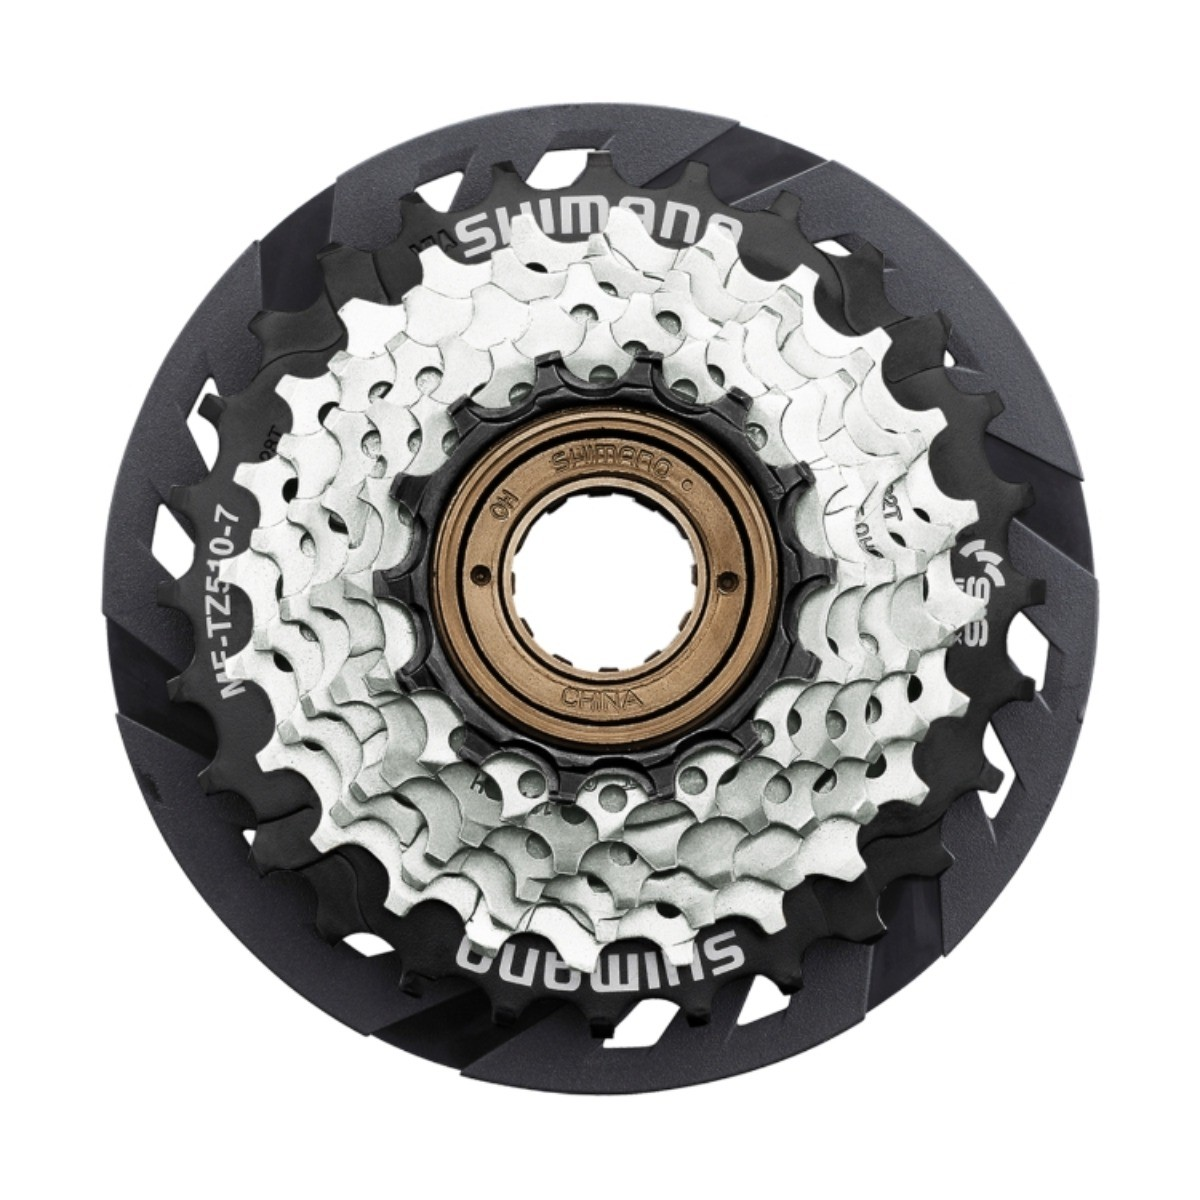 Roda Livre Bicicleta Tourney Mf-tz510 14/28 Dentes Shimano